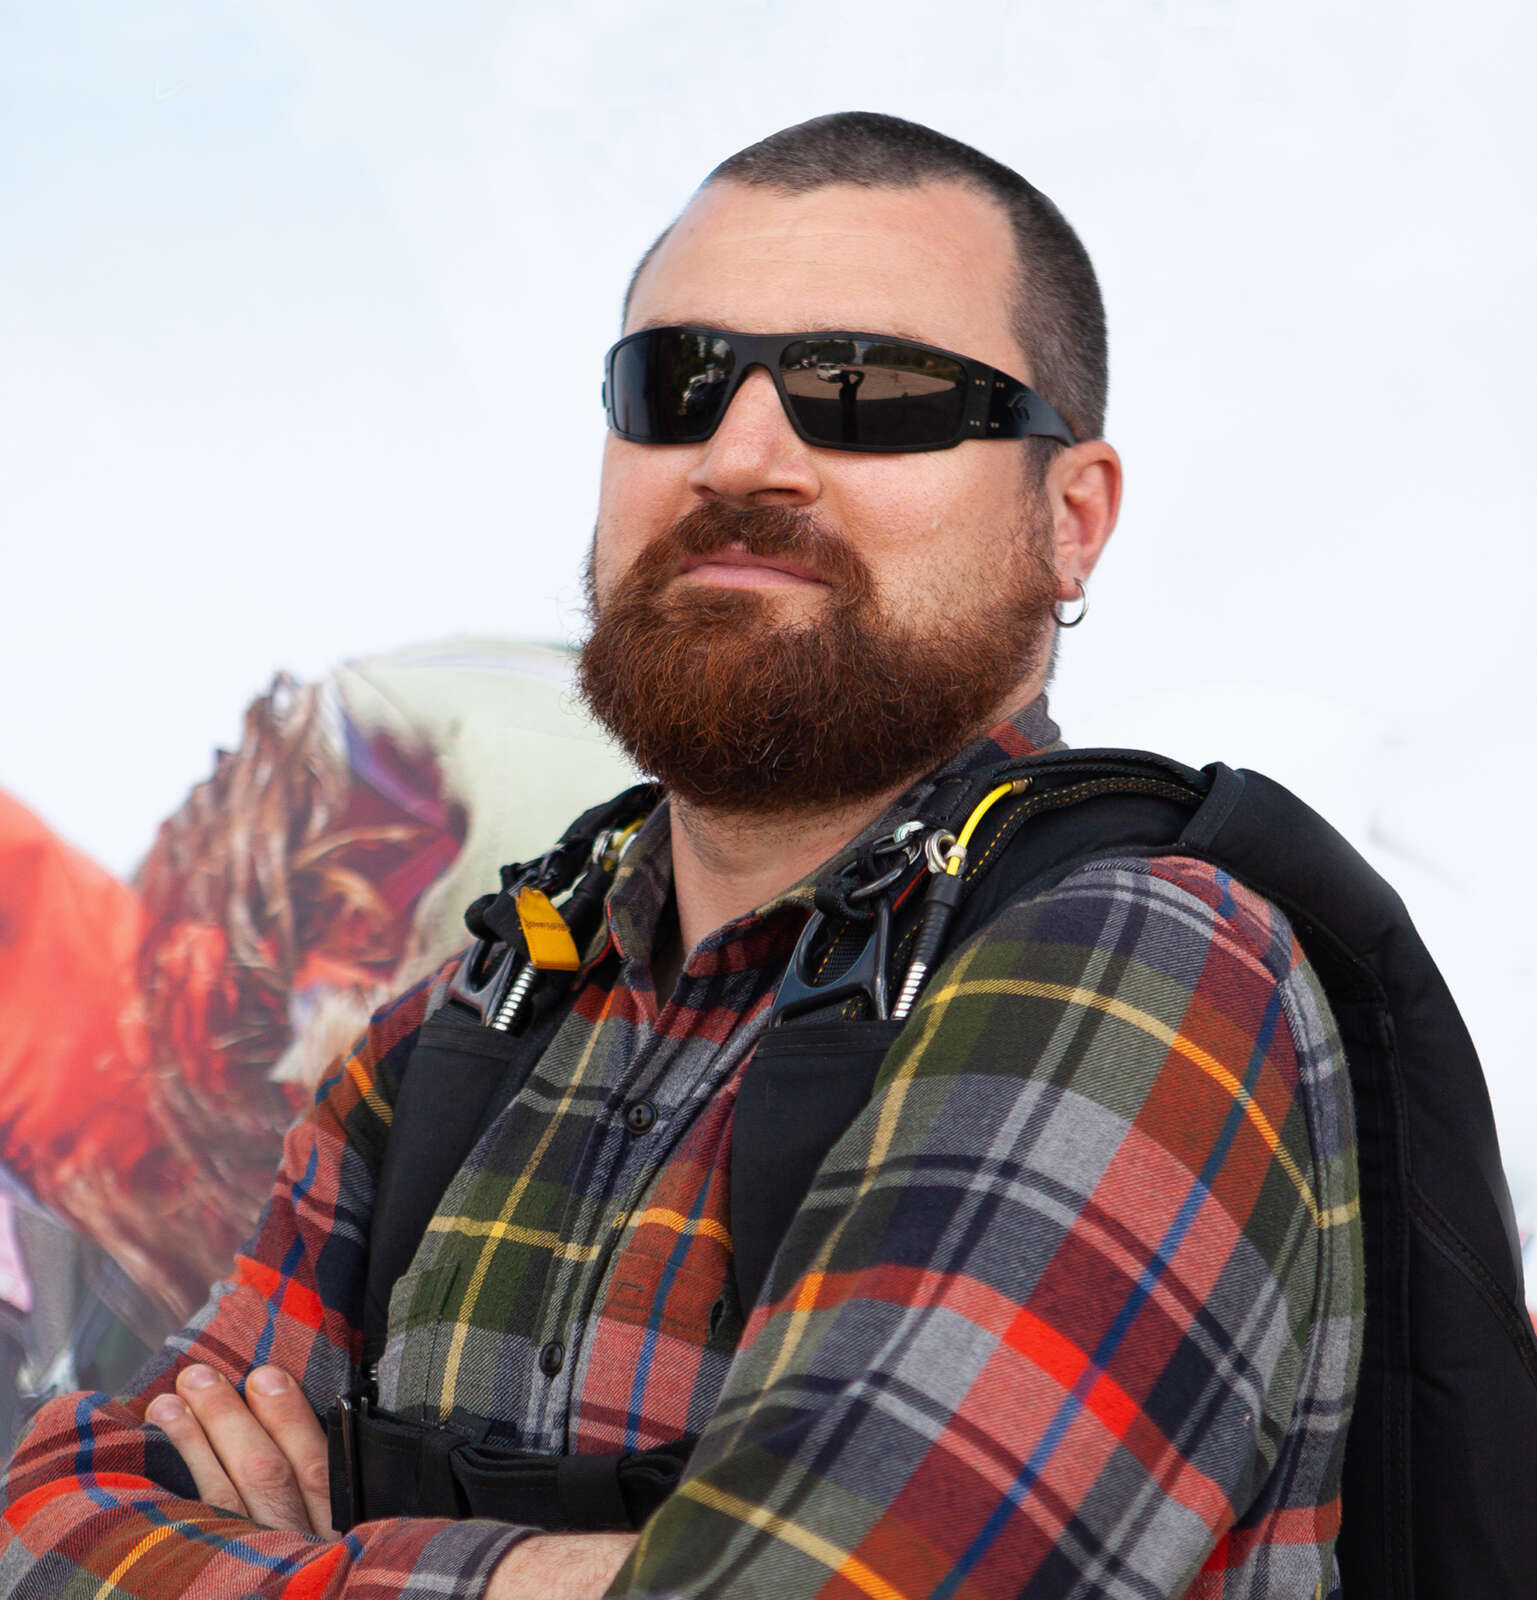 Алексей Боярчук - Тандем-инструктор - Skydive Academy